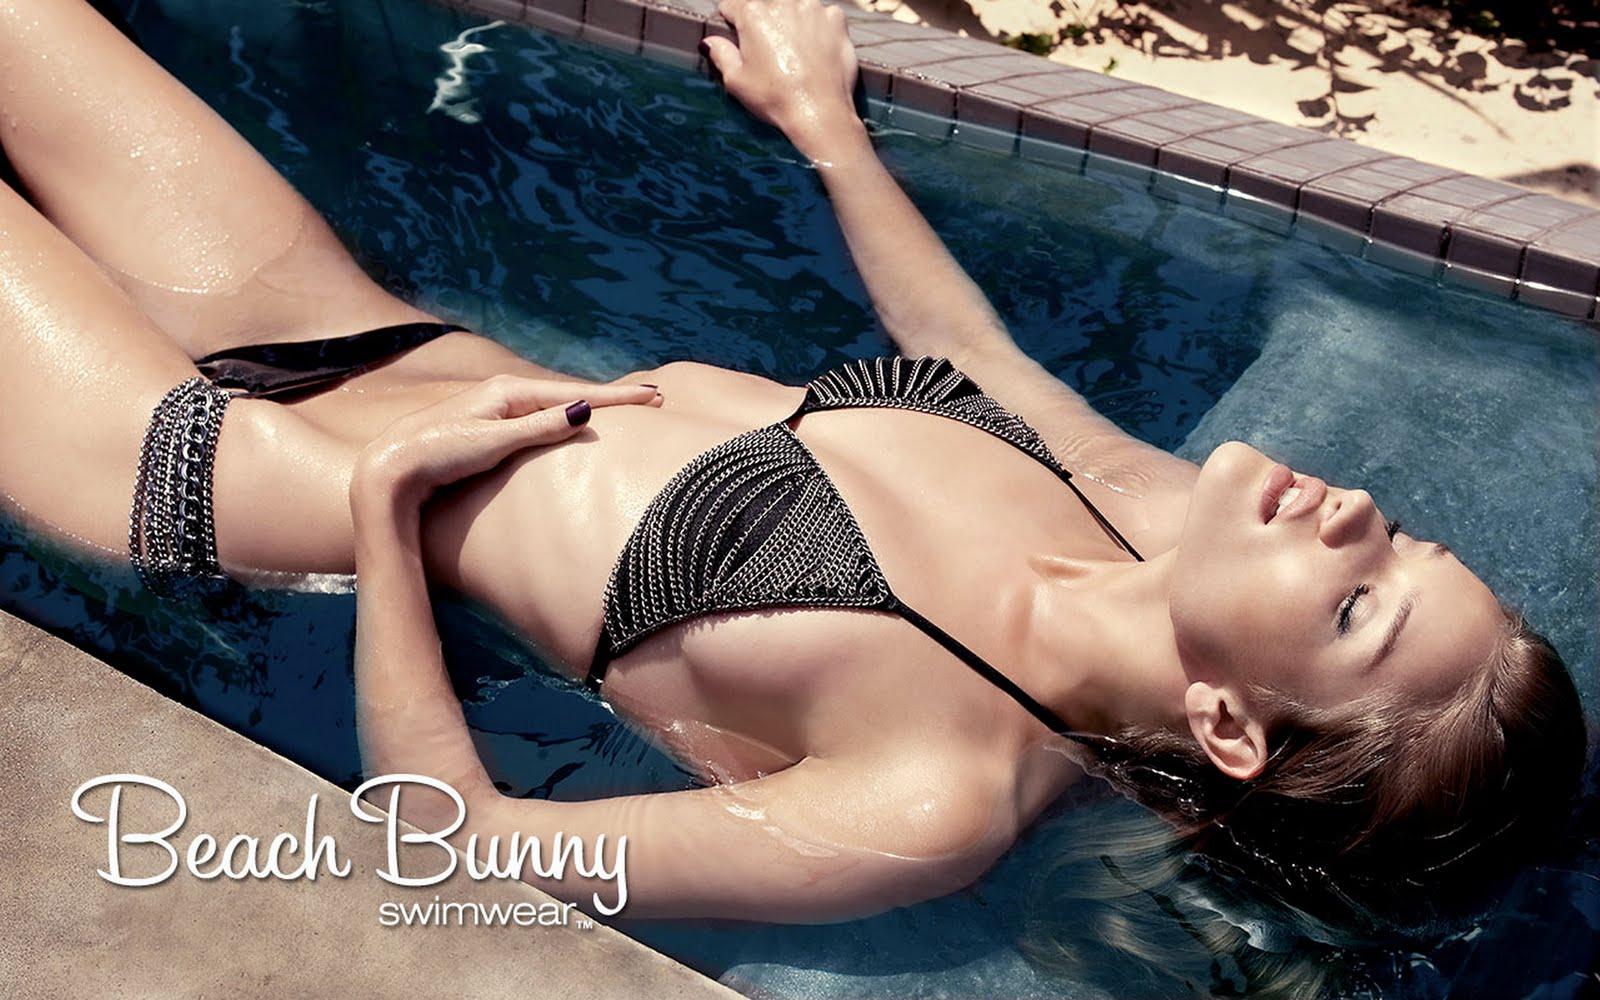 http://2.bp.blogspot.com/-pSpUROjF0k0/TmK4NOv6cmI/AAAAAAAAEpo/70rugxxn5Ds/s1600/Rosie_Huntington_Whiteley_Beach_Bunny_Swimwear_Photos.jpg